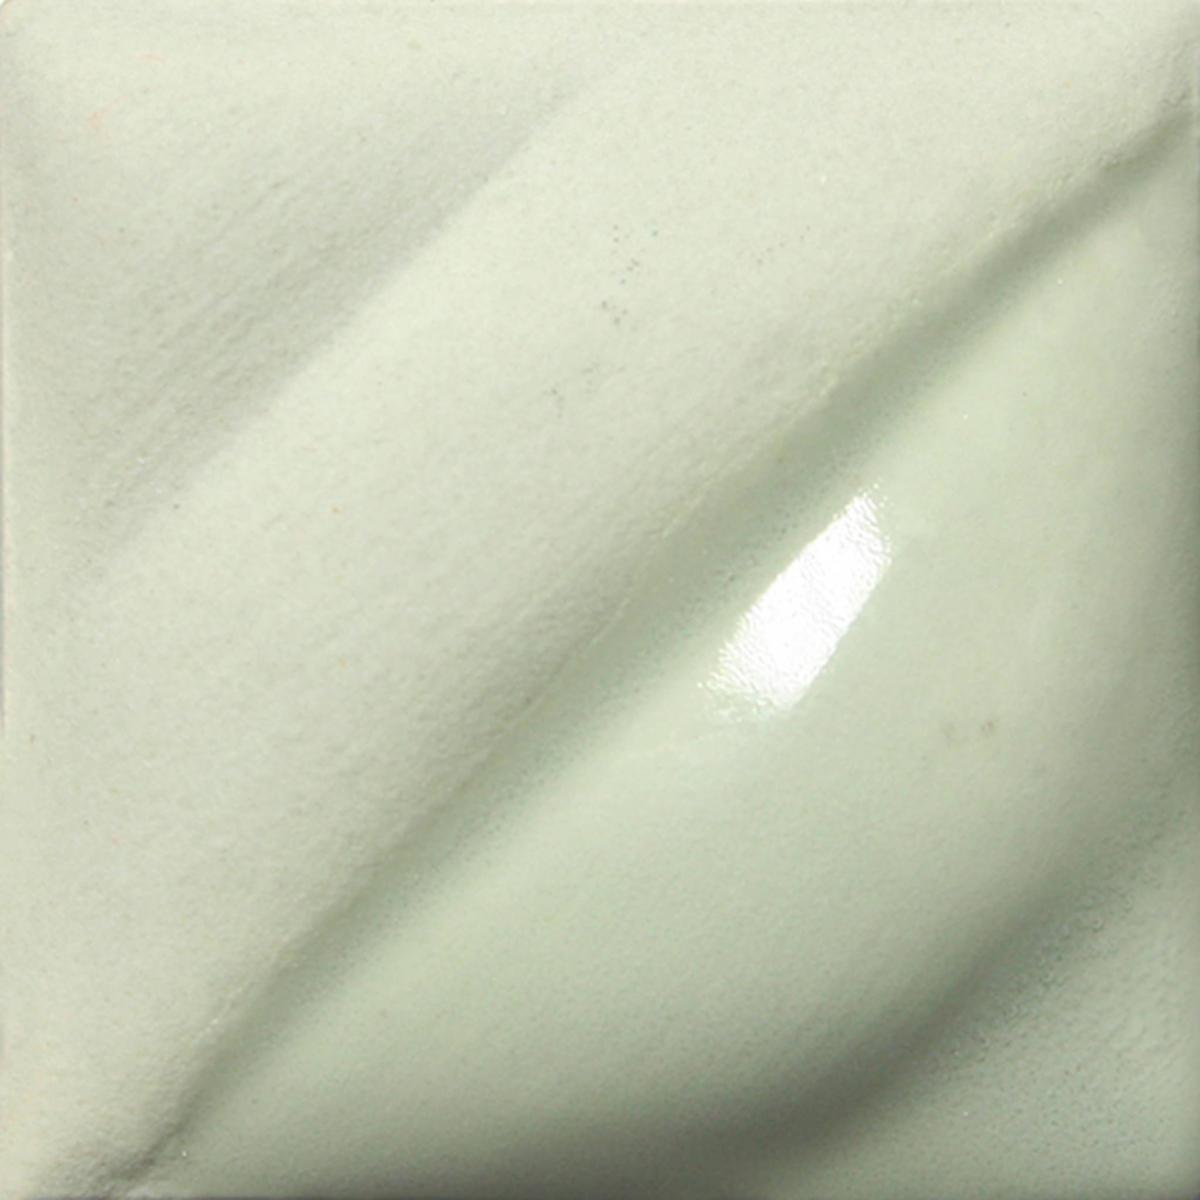 venta de esmalte para cerámica amaco velvet V-367 mist gray bajo esmalte